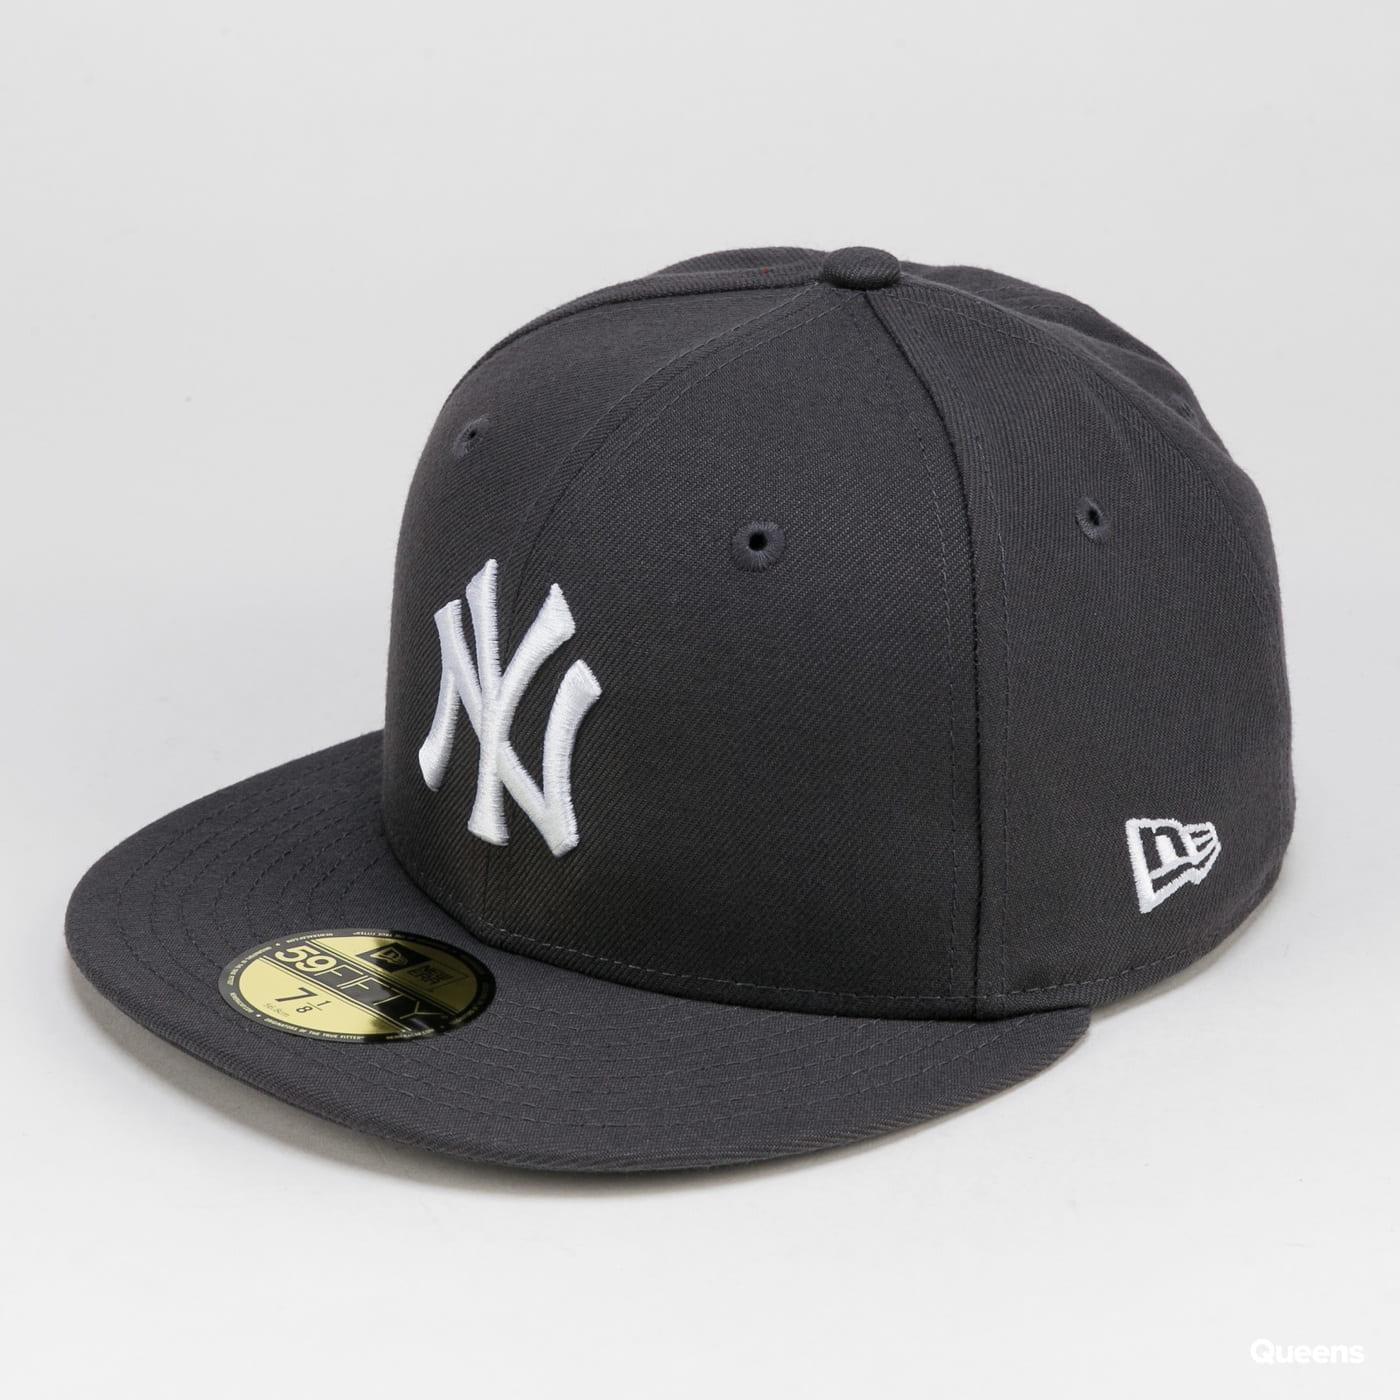 New Era MLB Basic NY C/O dunkelgrau / weiß